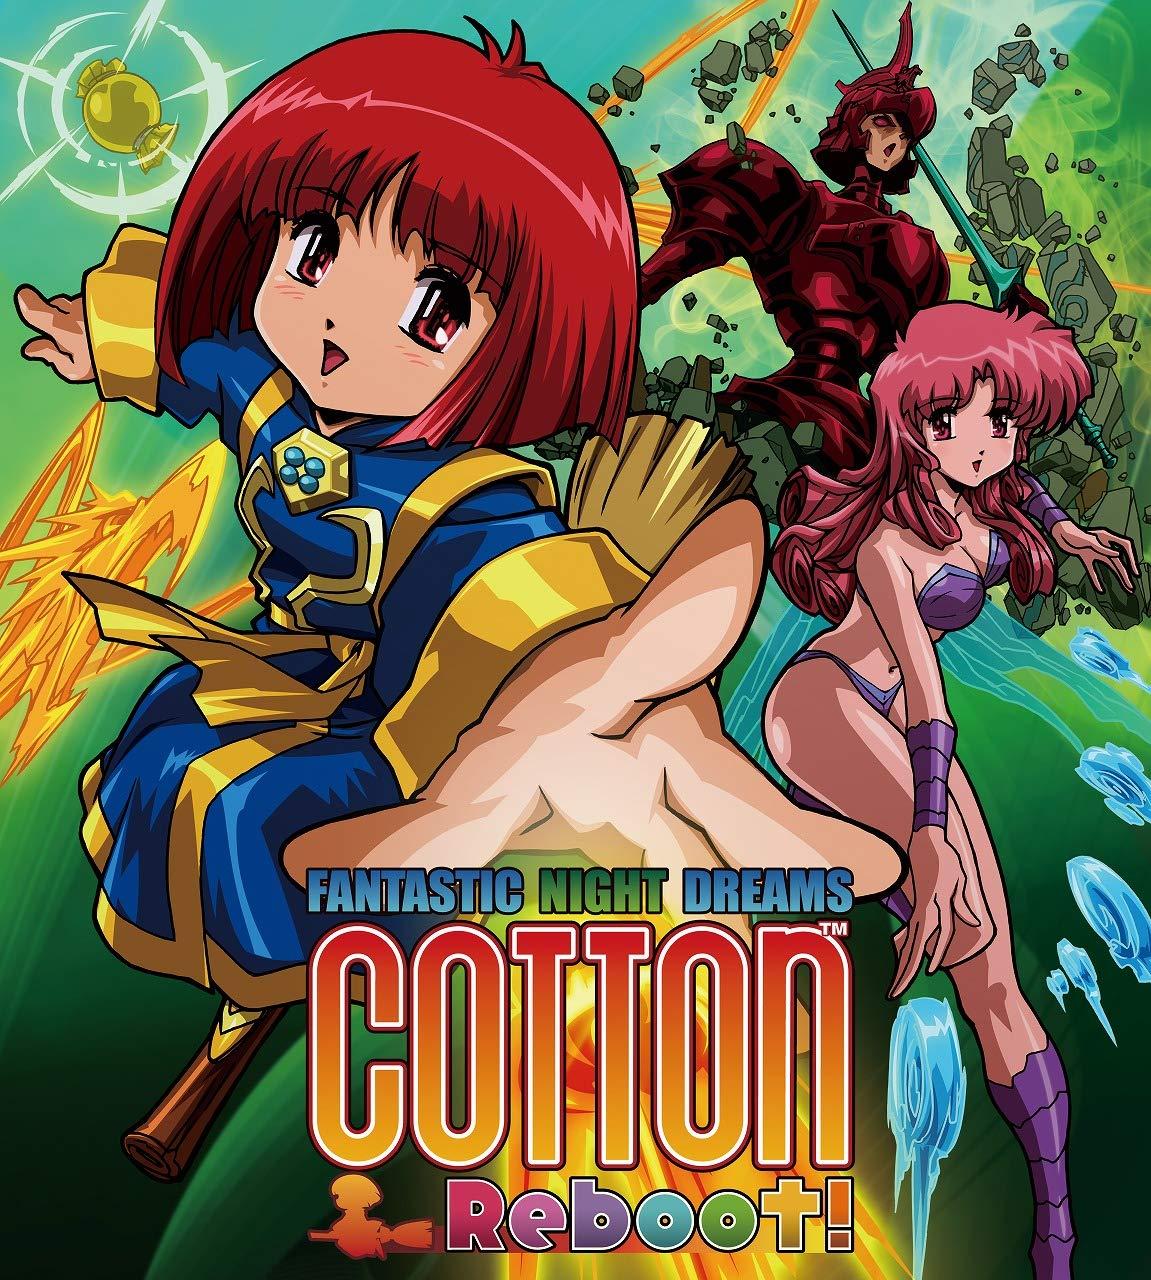 Cotton-Reboot_2020_10-20-20_001